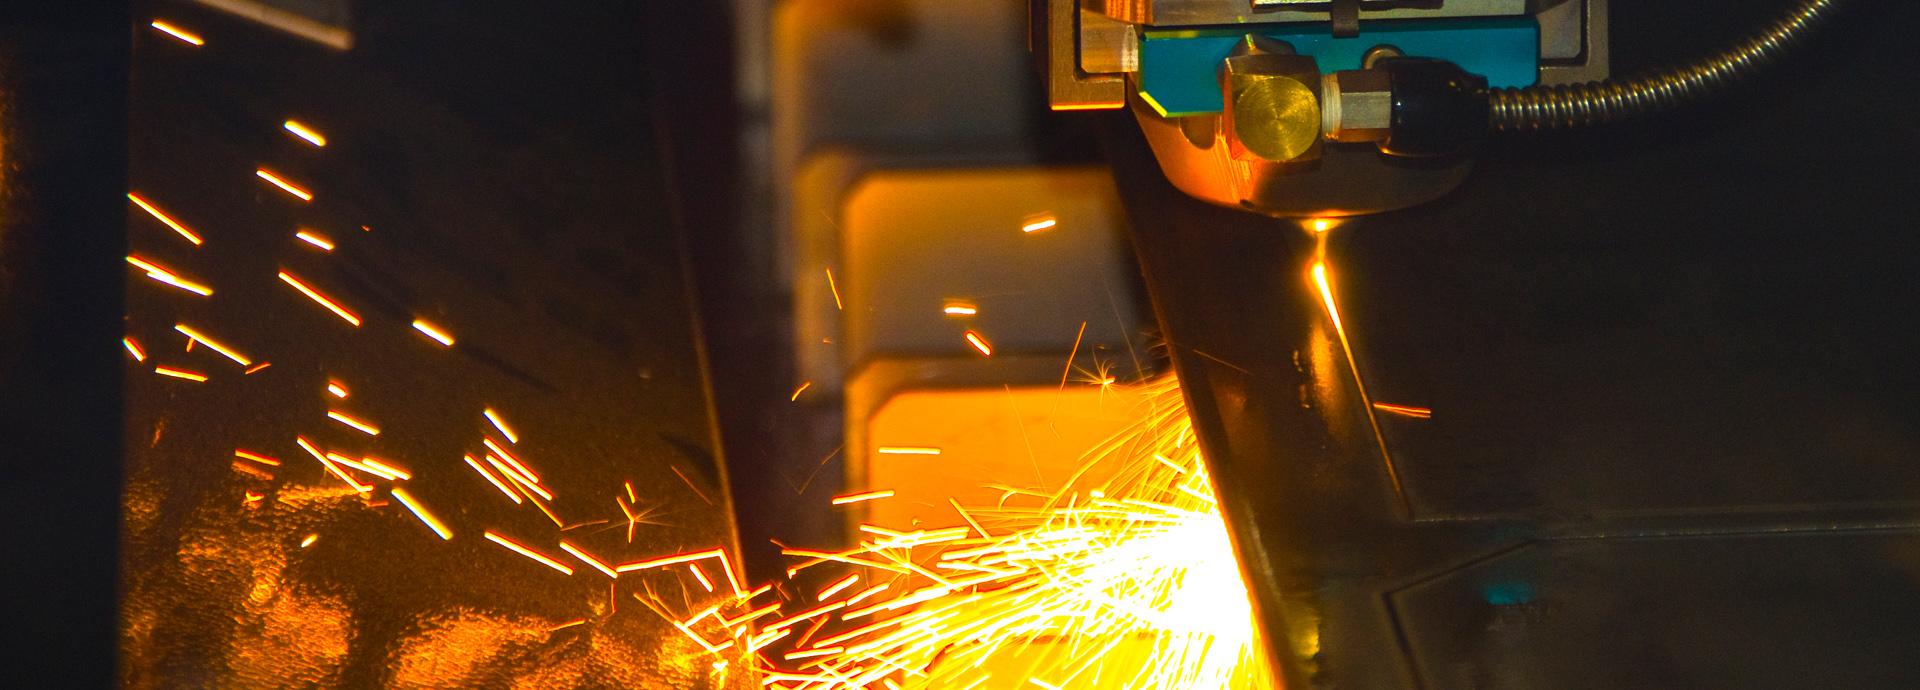 Laser Cutting | Horschel Brothers Precision